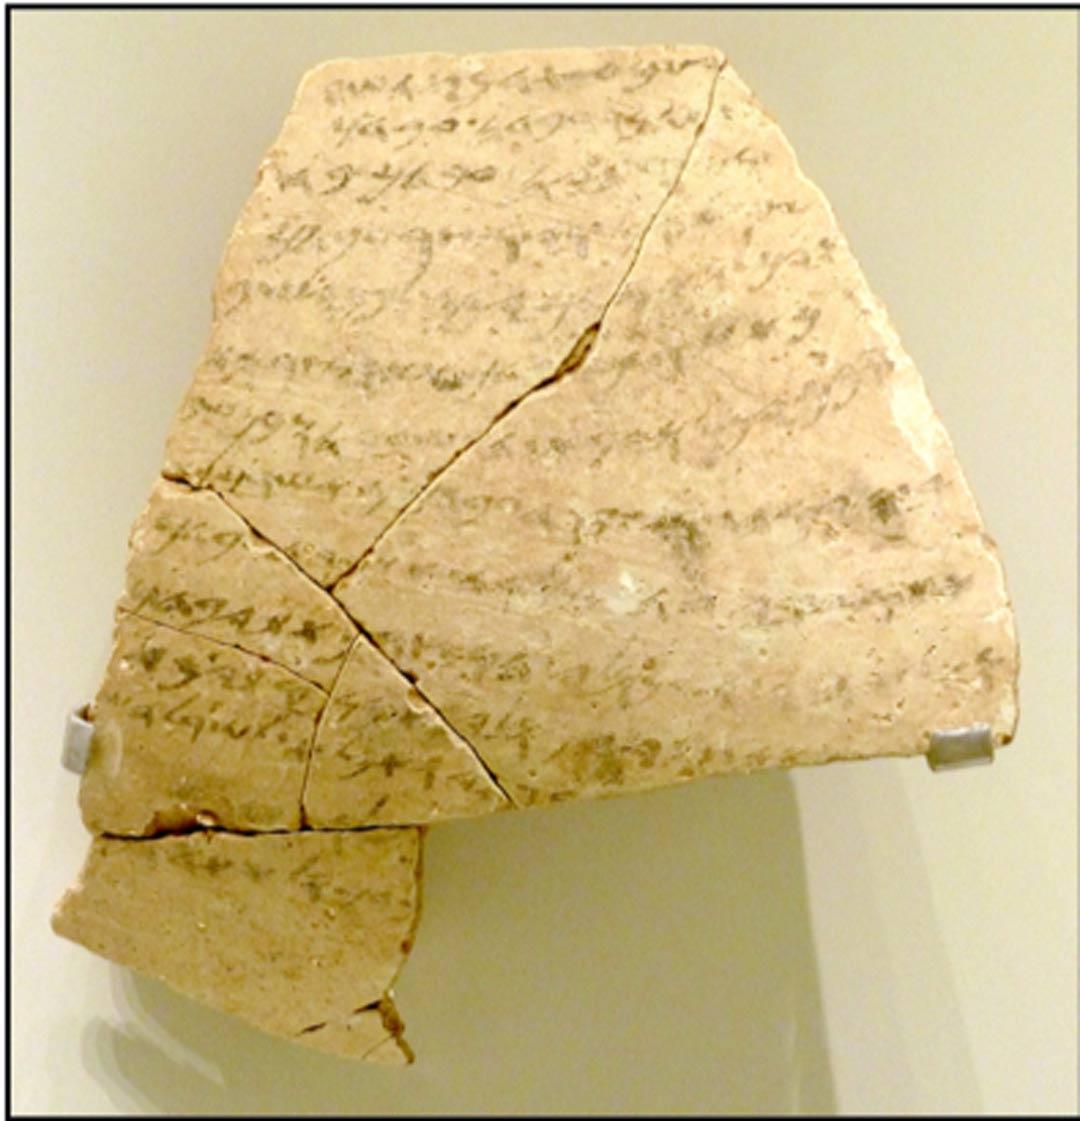 Ostracon found at Mesad Hashavyahu